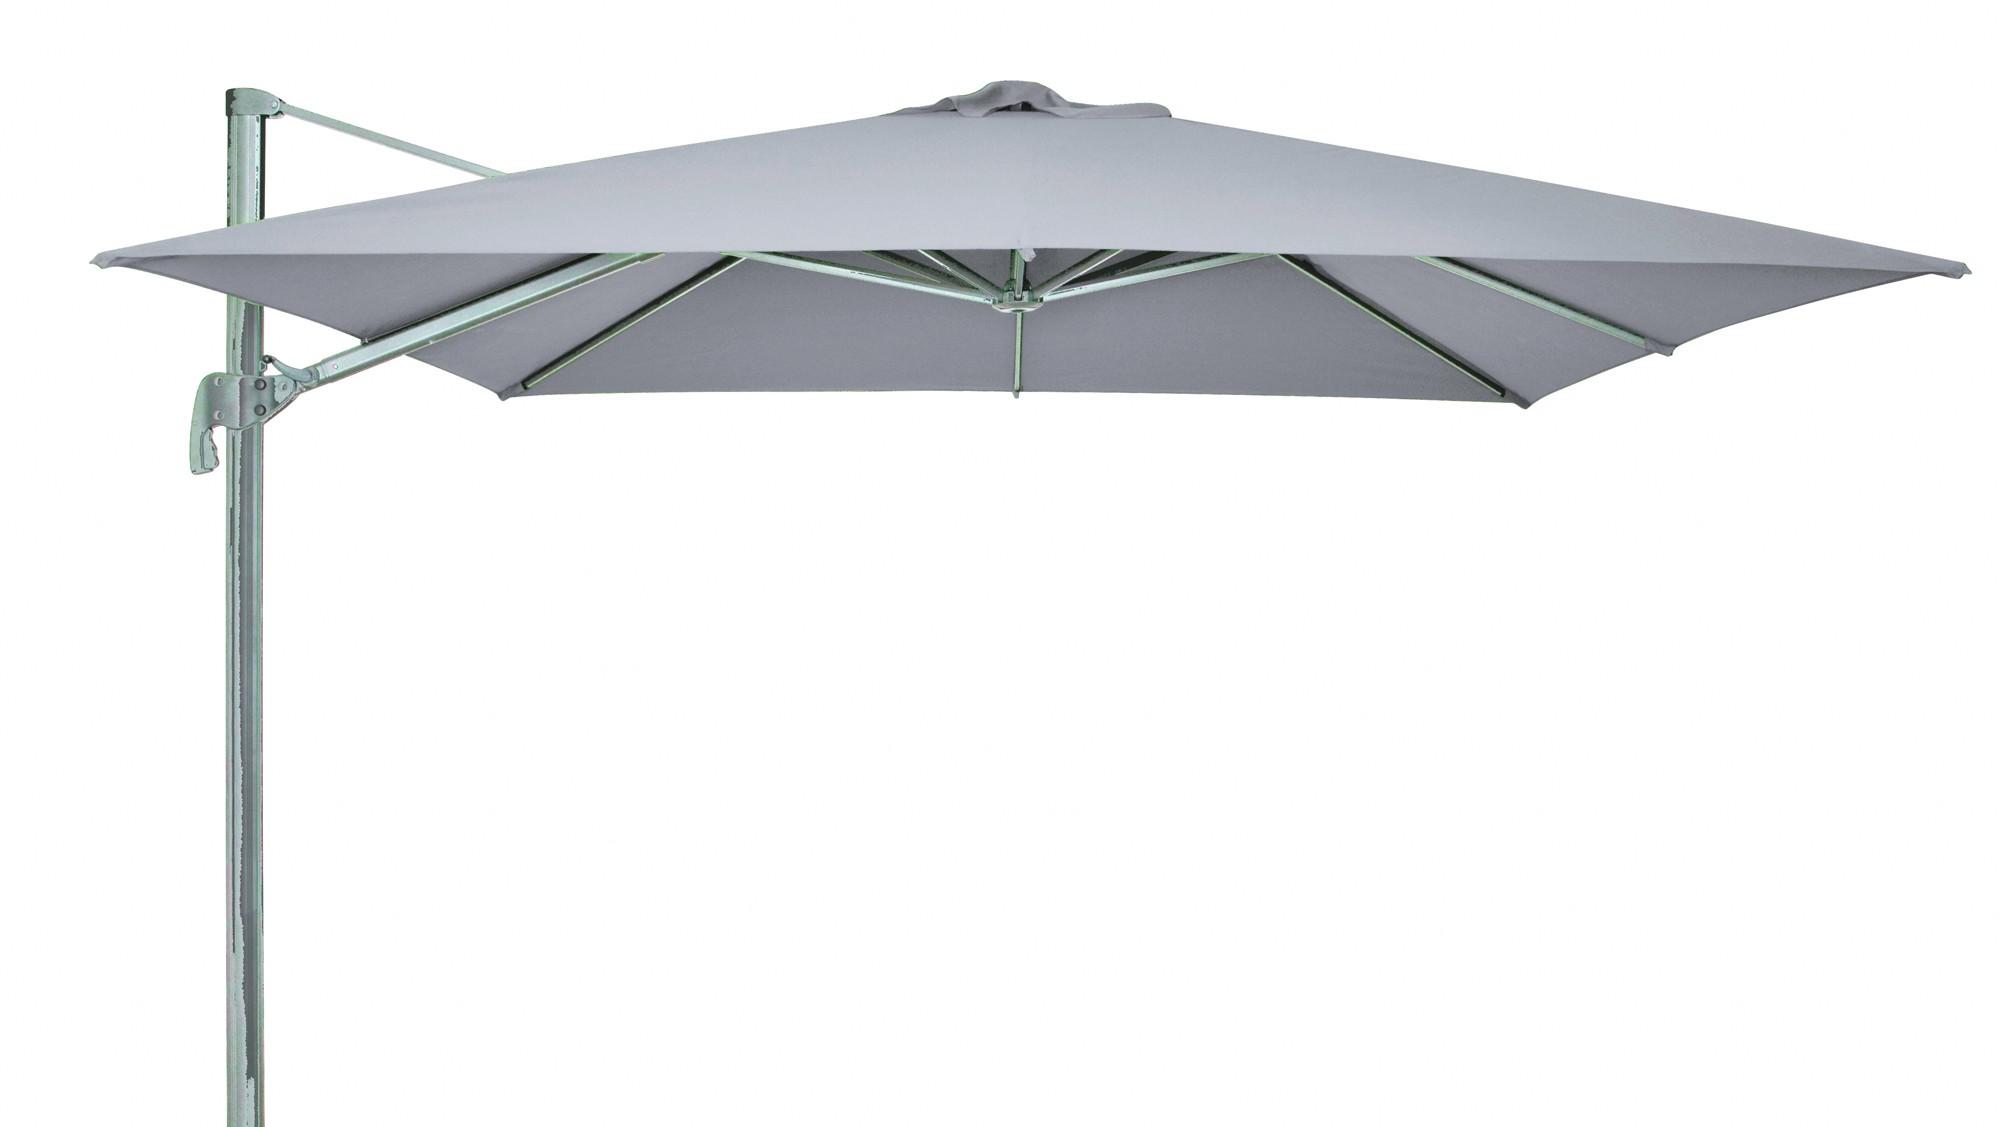 ampelschirm sonnenschirm derby ravenna 300x300cm d927 grau bei. Black Bedroom Furniture Sets. Home Design Ideas